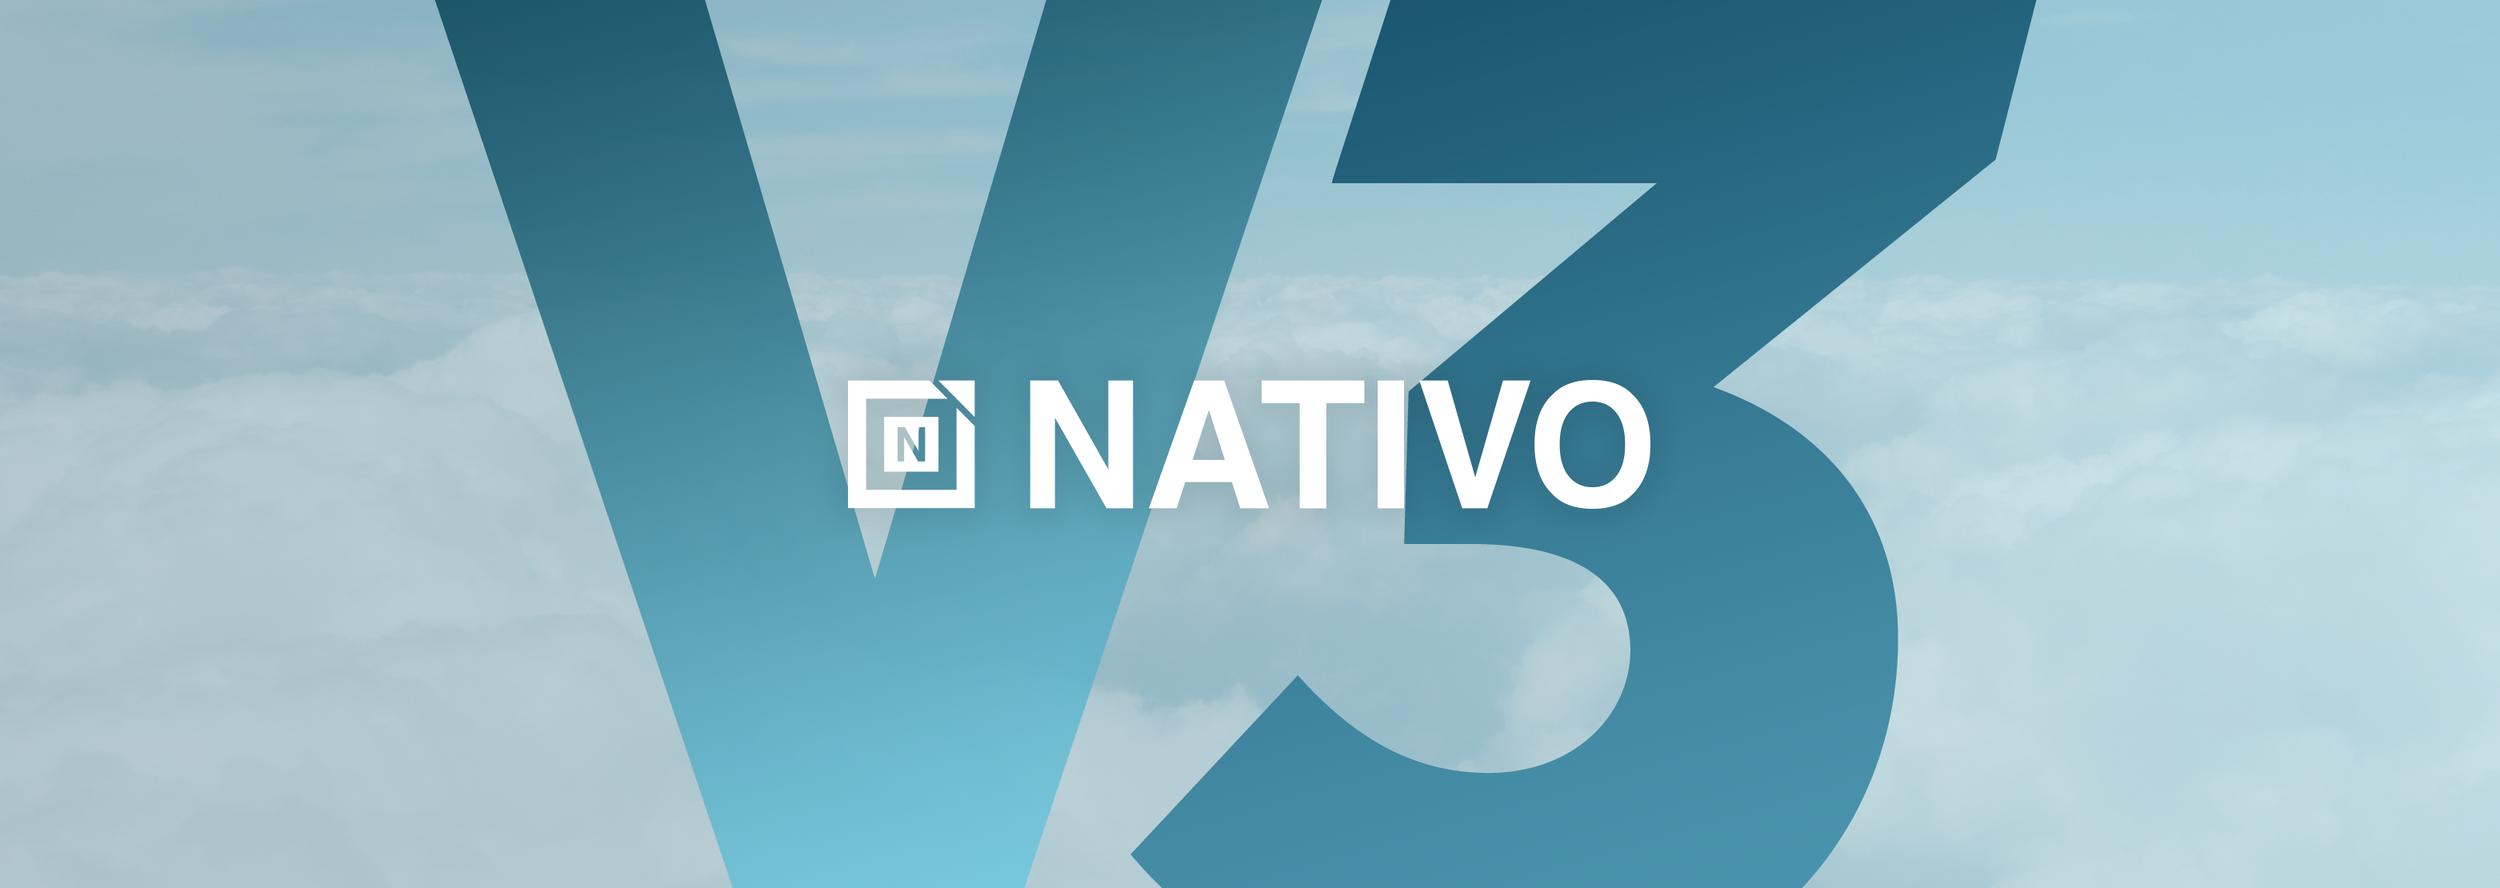 NATIVO-V3.png